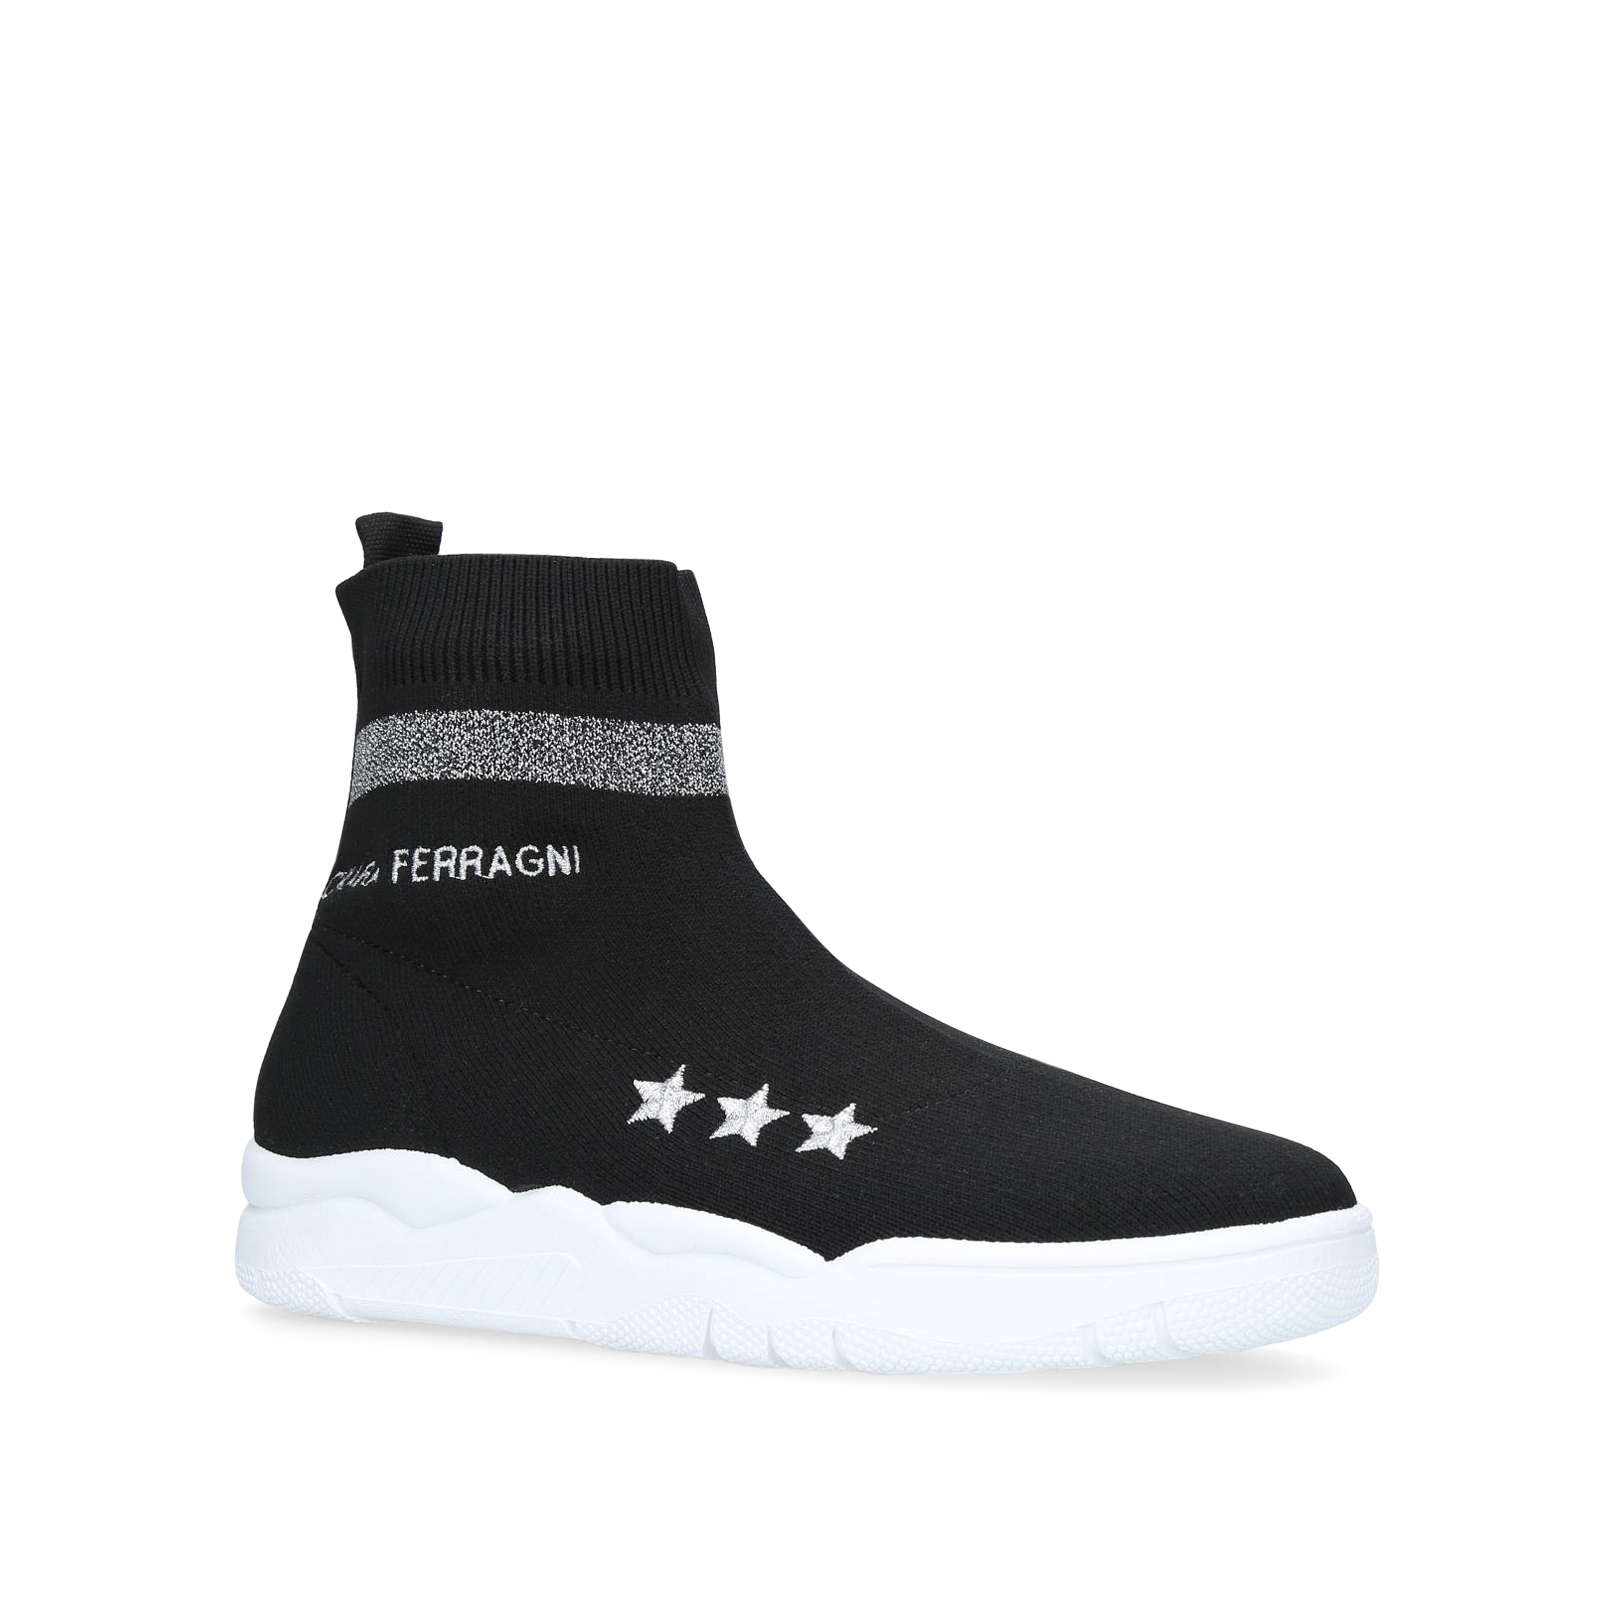 0ca3b7d40 SOCK RUNNER - CHIARA FERRAGNI Sneakers